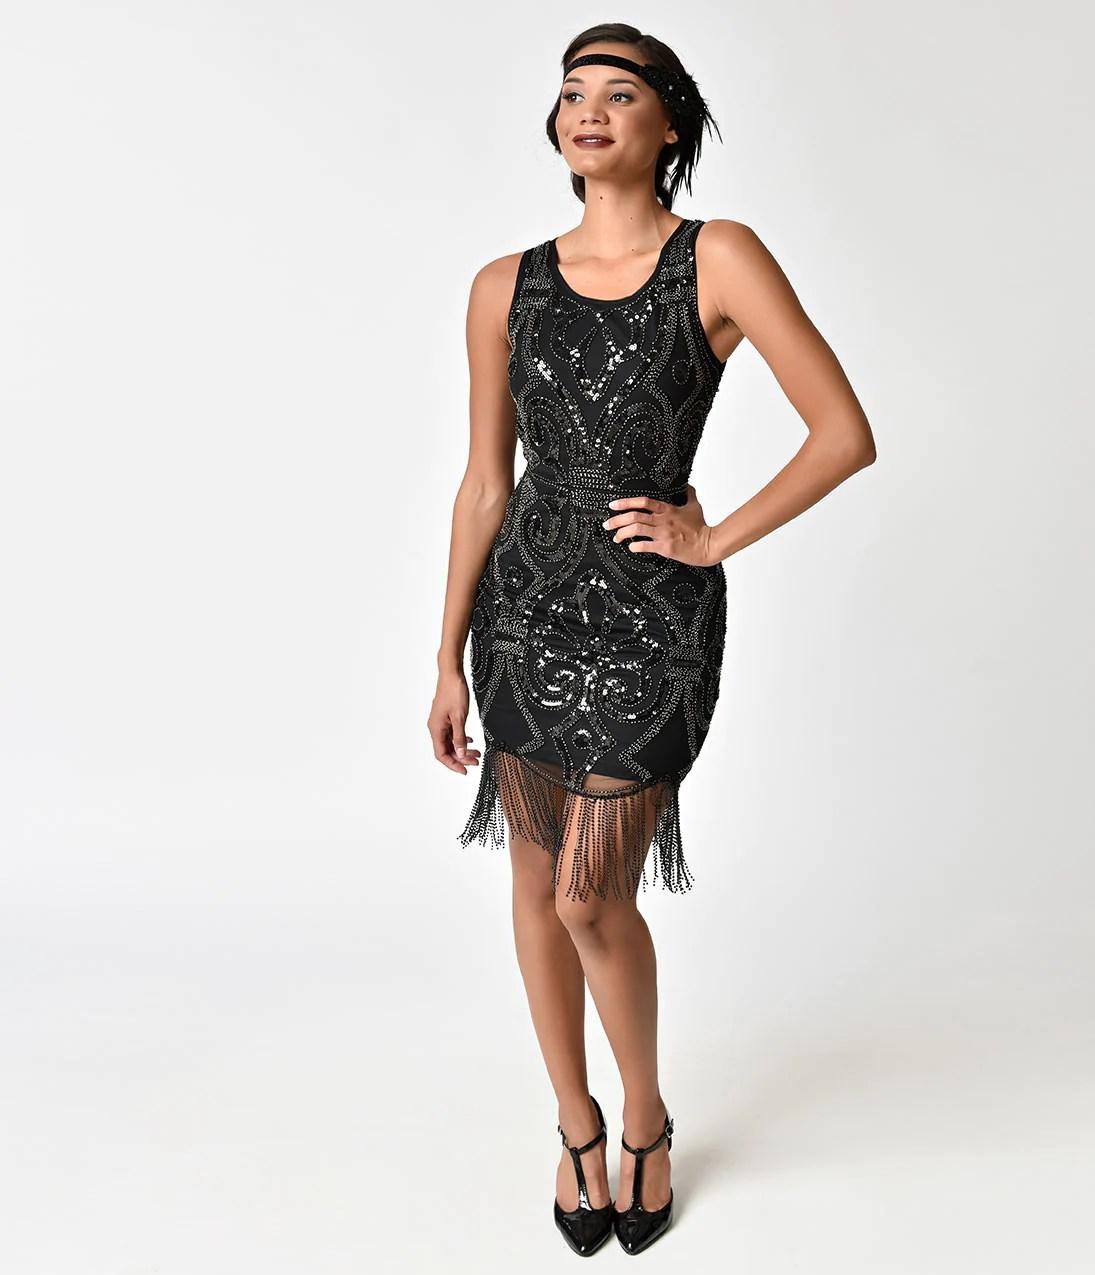 Jcpenney Formal Dresses